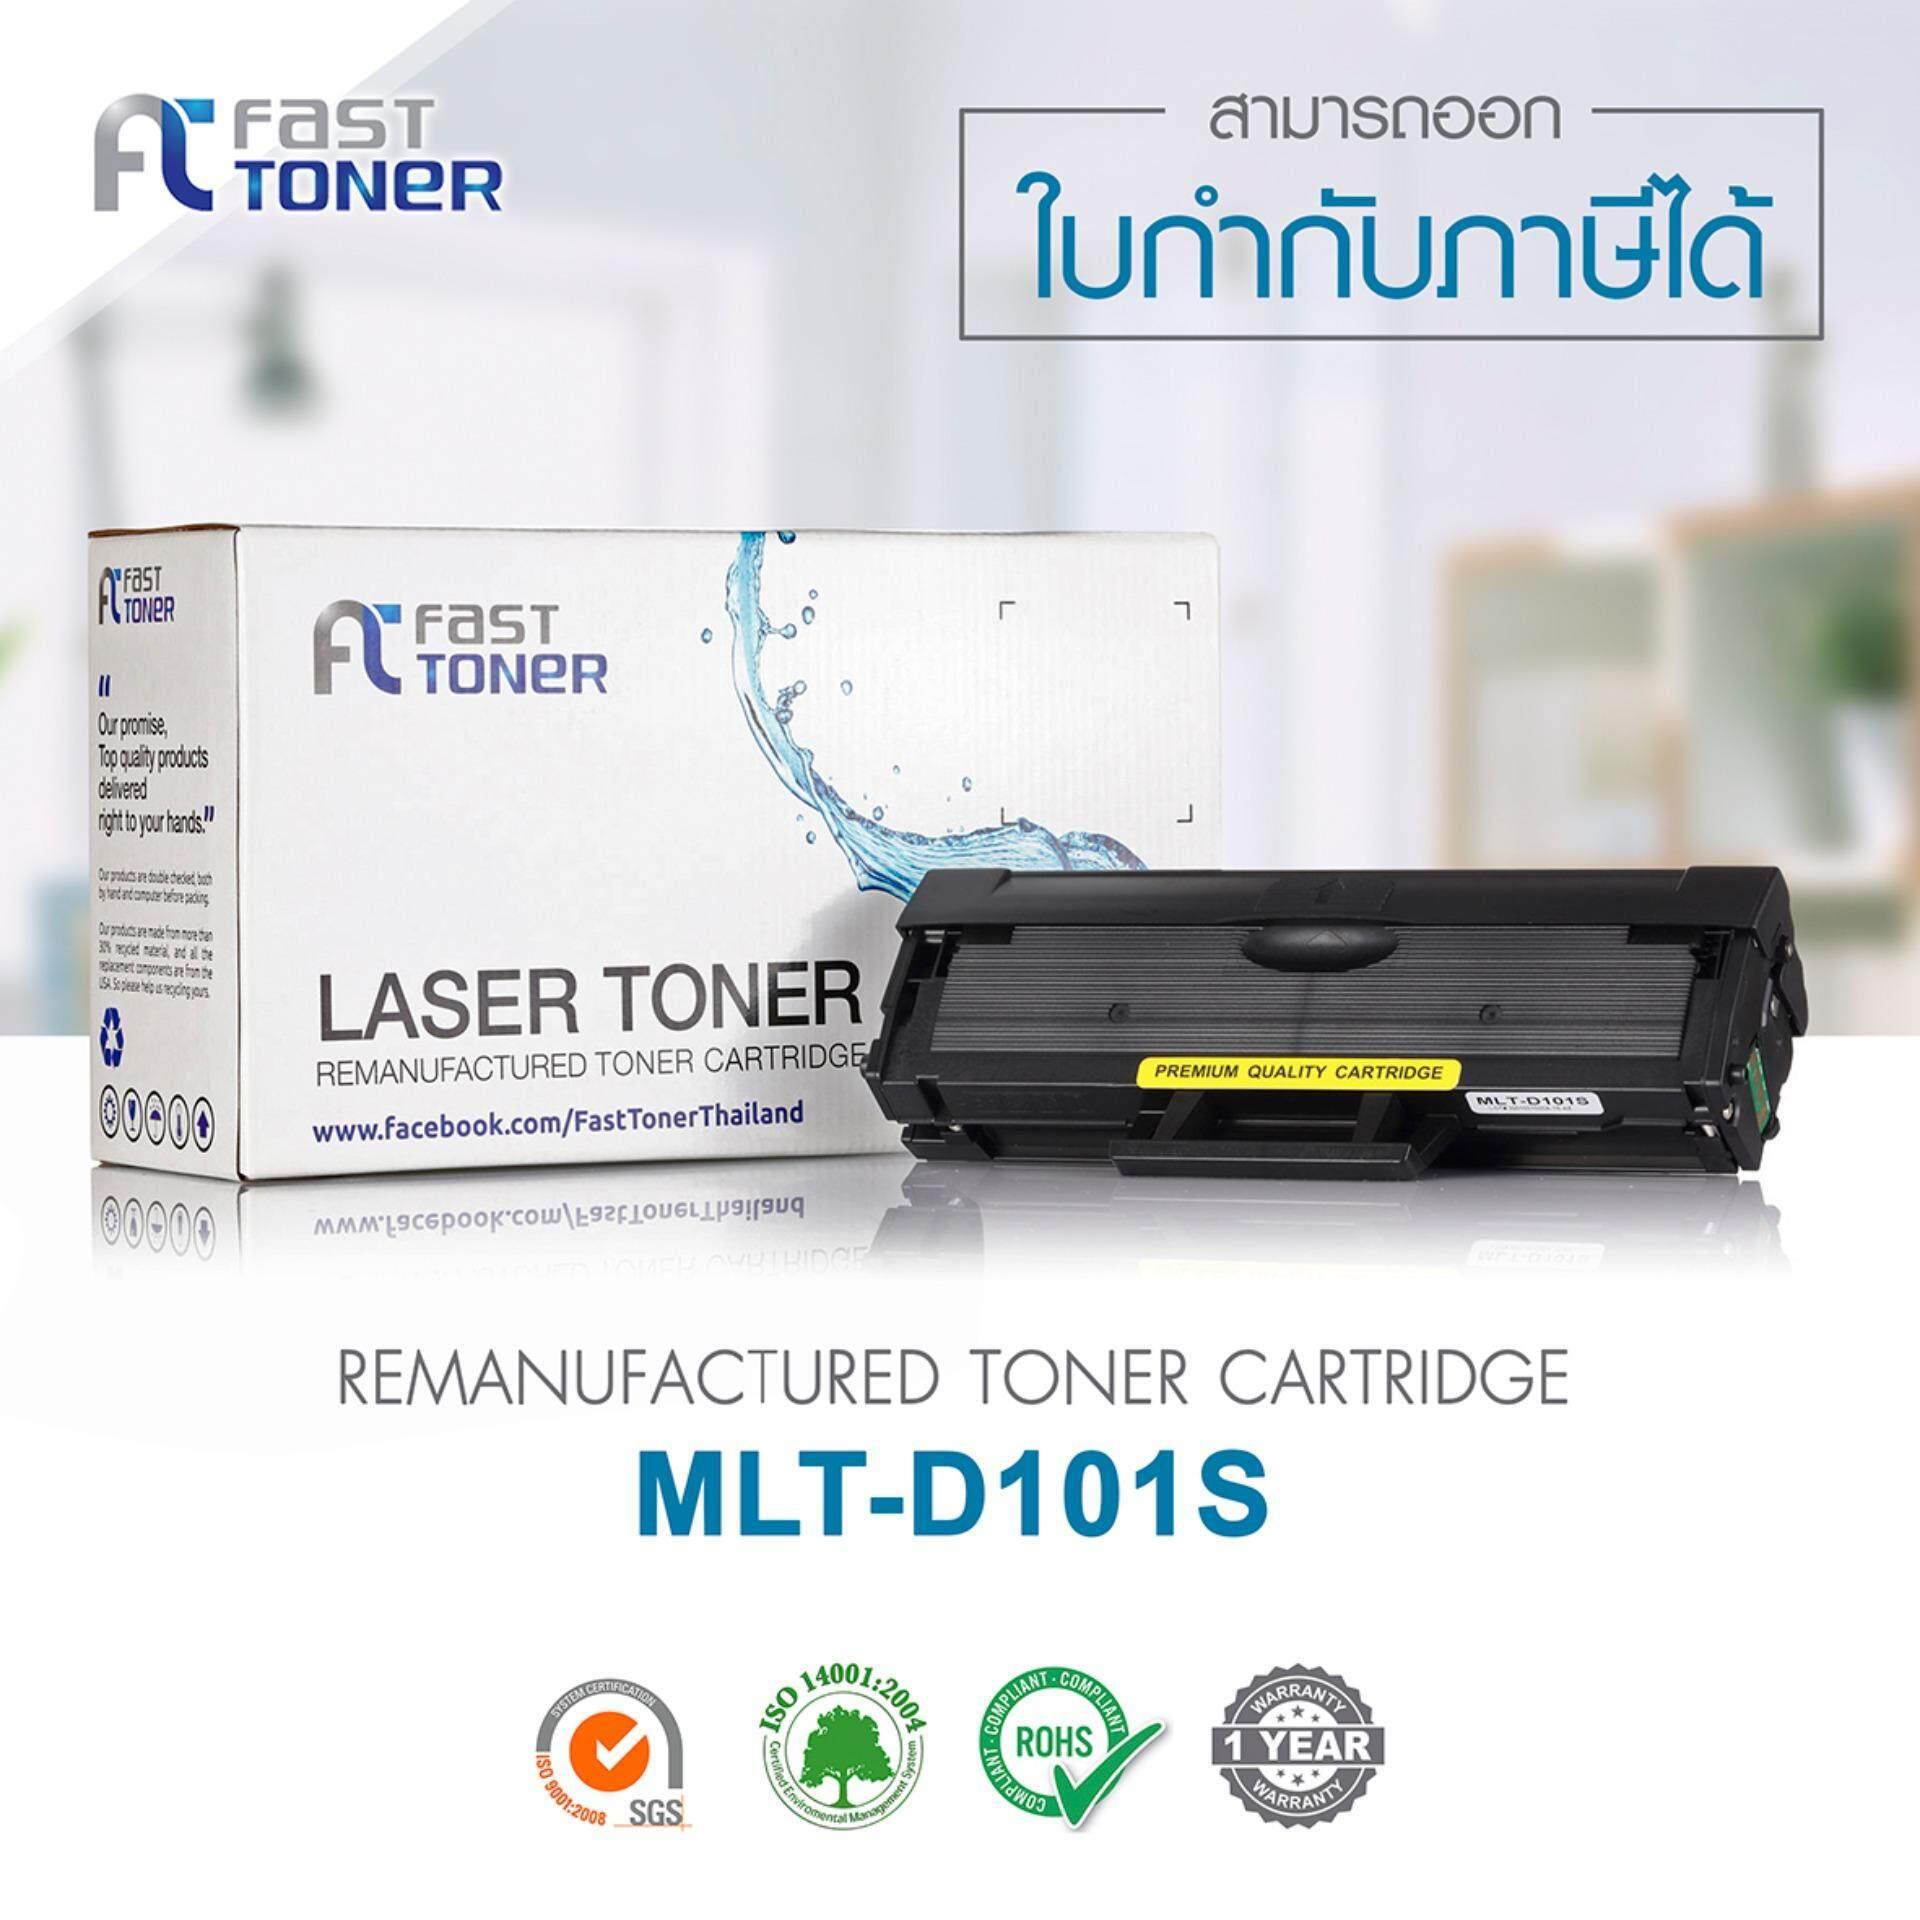 Fast Toner ตลับหมึกเทียบเท่า Samsung Ml 2160 Ml 2165 Ml 2160W Ml 2165W Ml 2168W Samsung Mlt D101S Bk ถูก